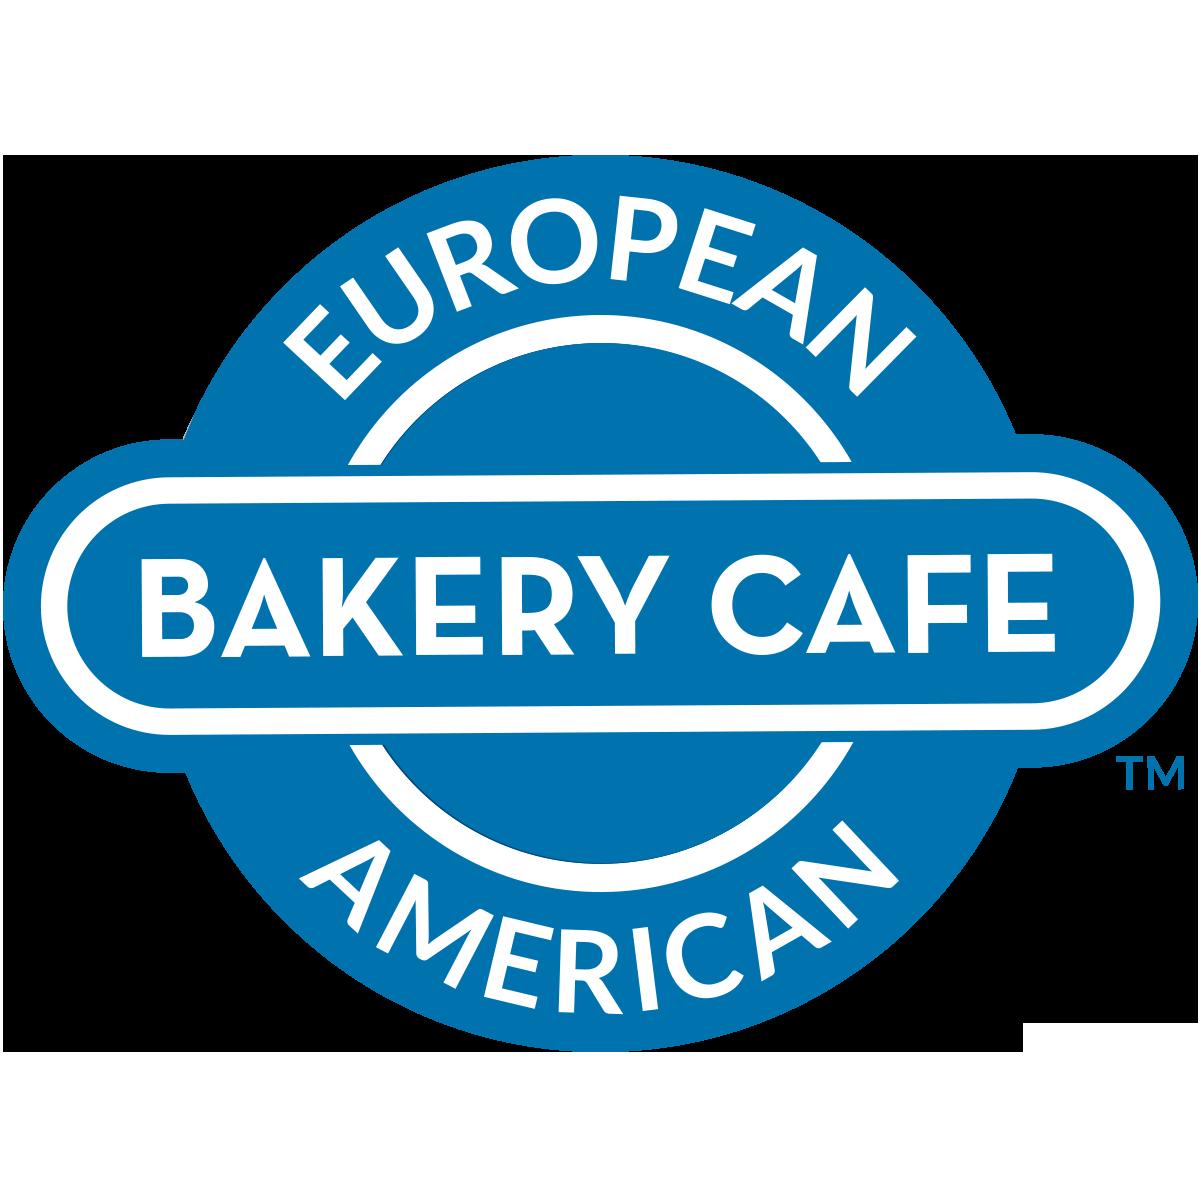 European American Bakery Cafe